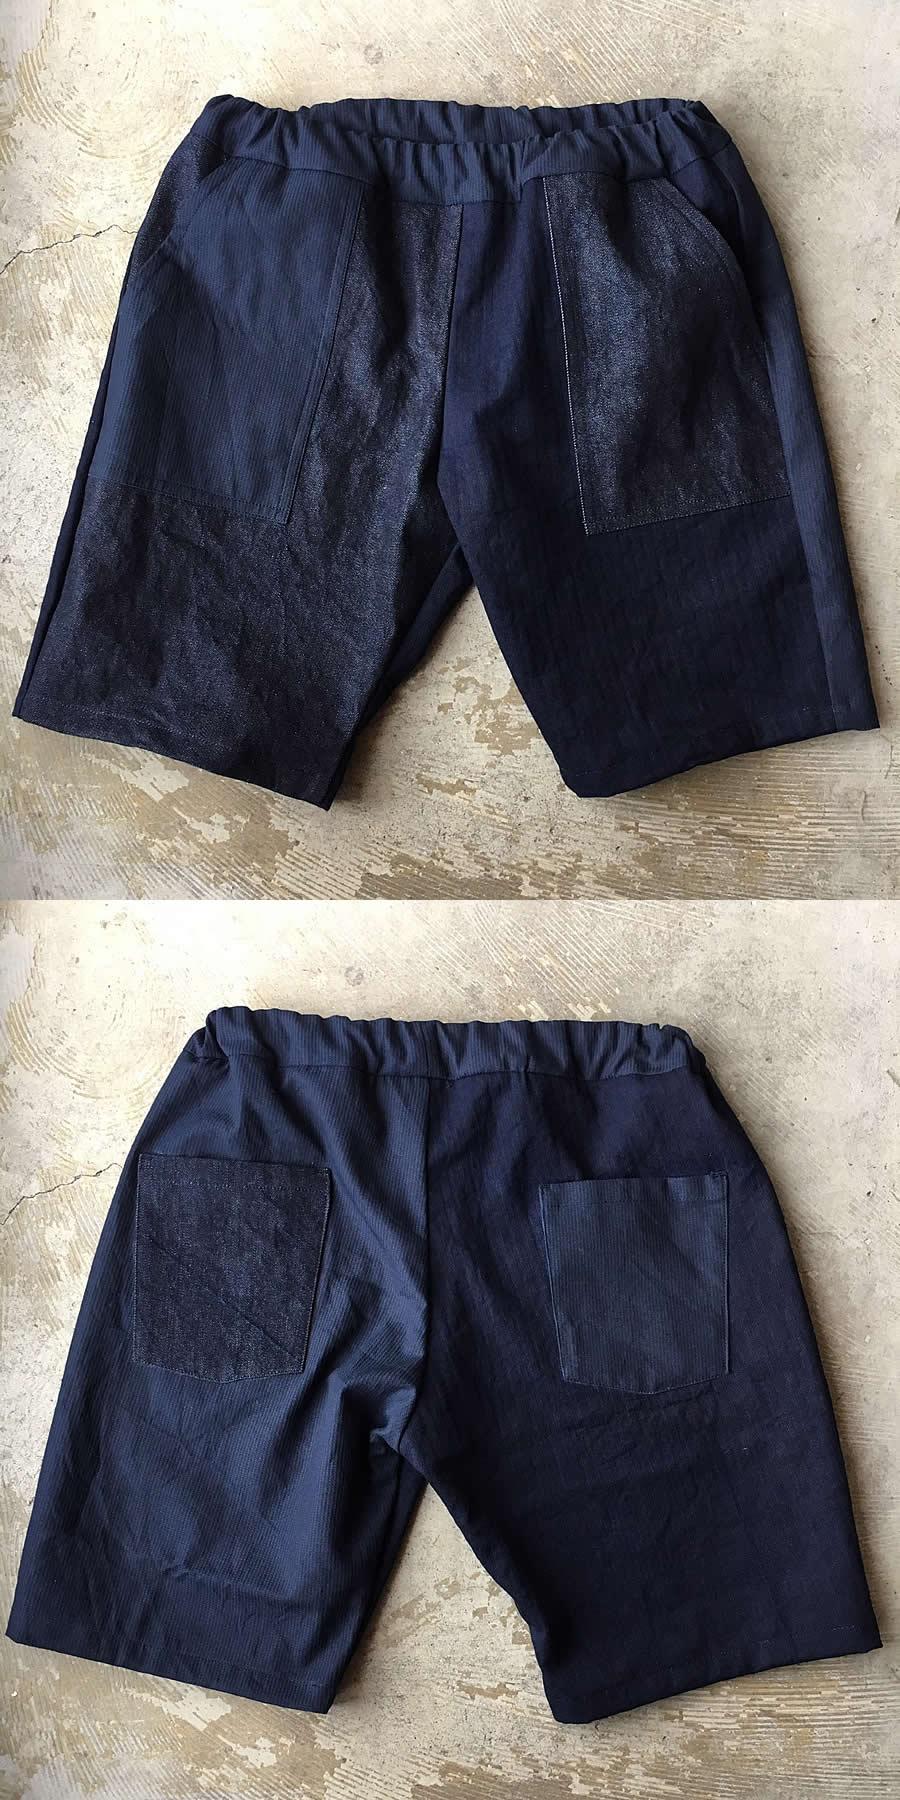 atelierdevetements-shorts-a-33.jpg